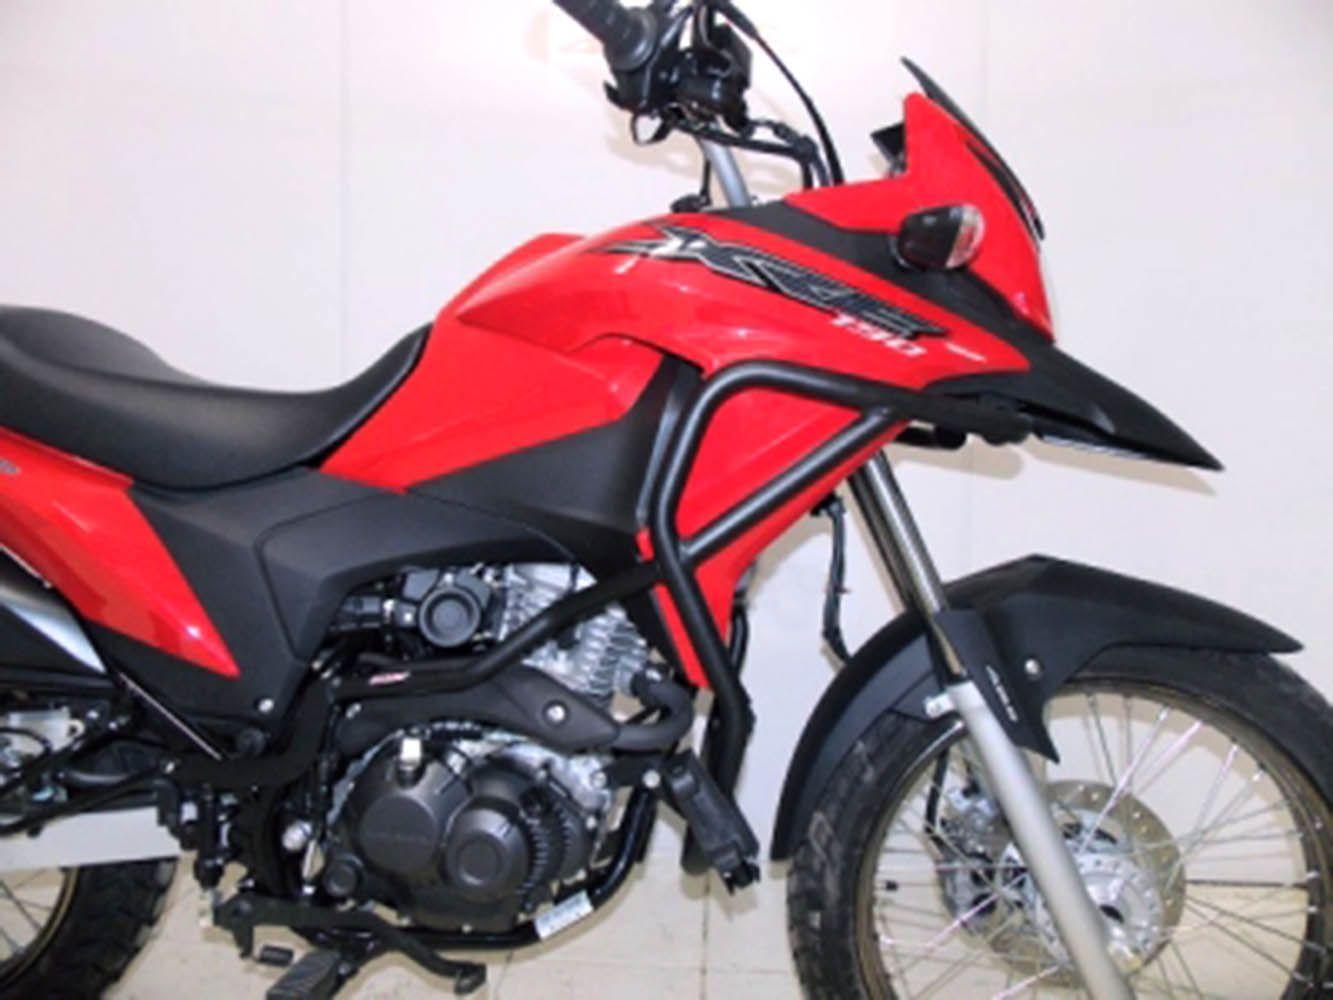 Protetor Carenagem Xre 190 Motor Chapam 10244